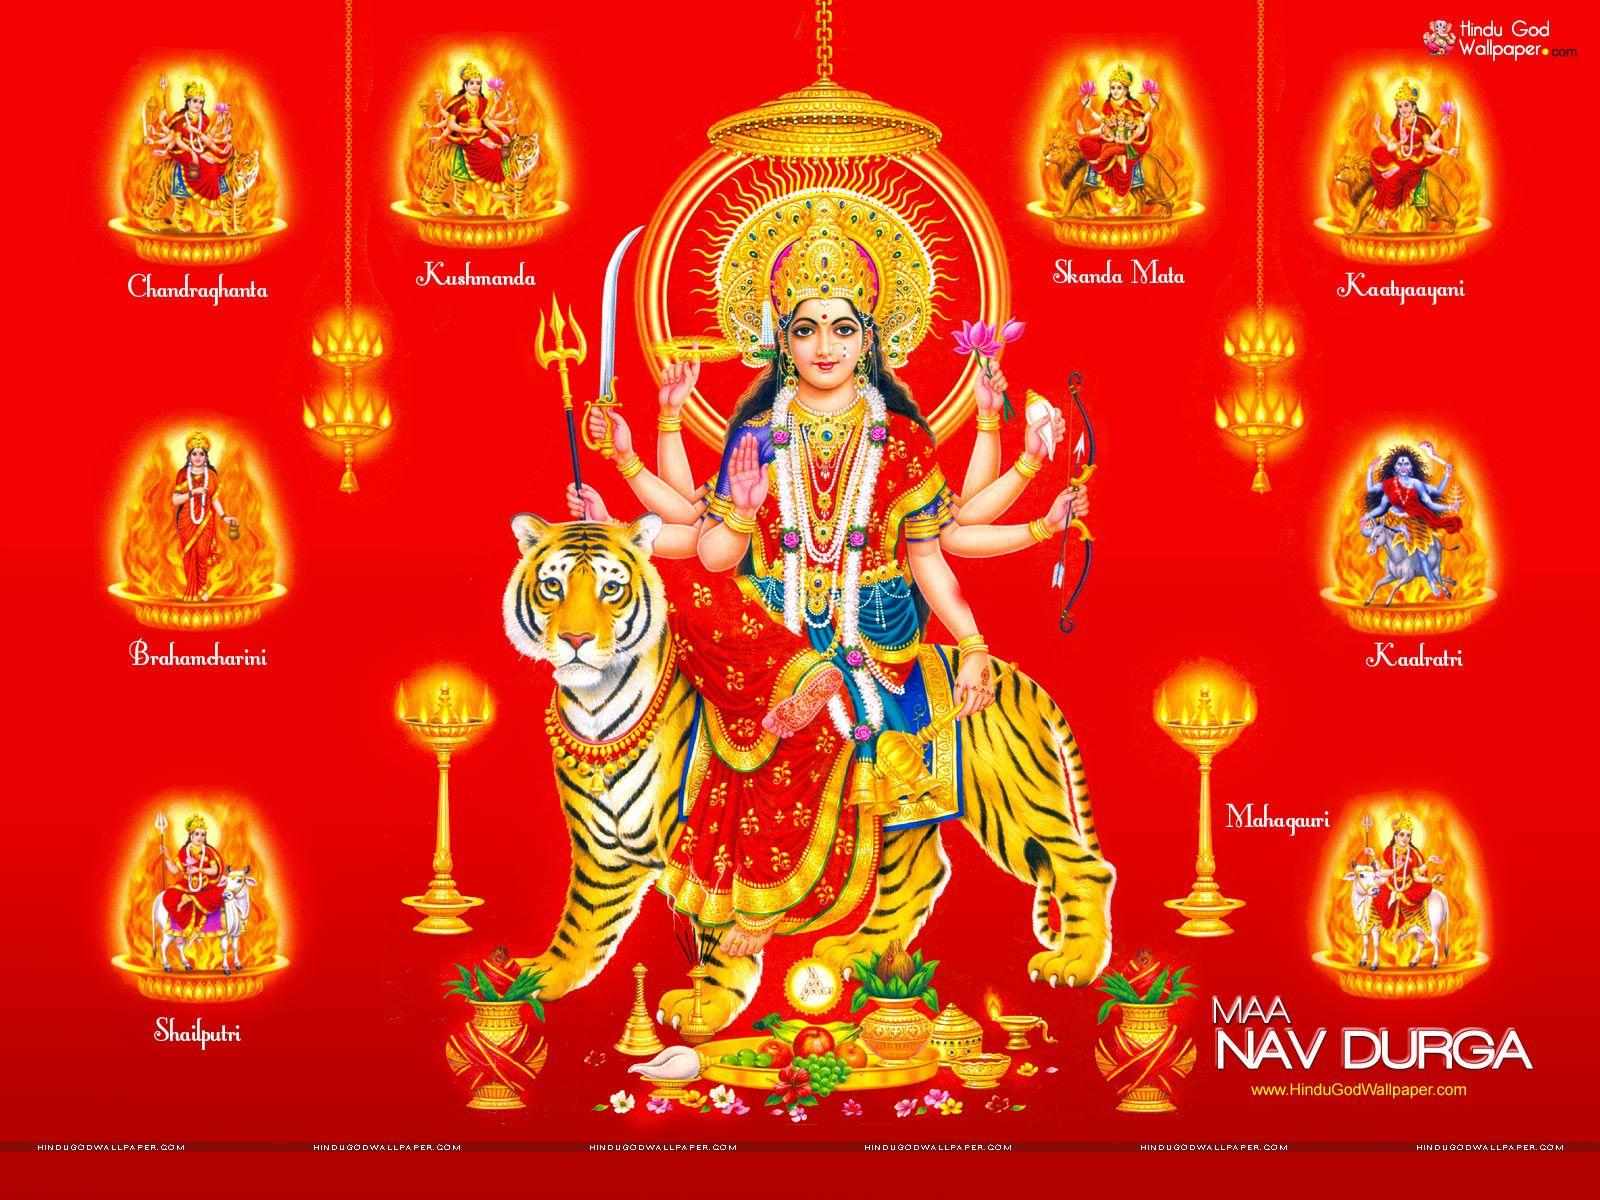 Shubh Navratri HD Wallpapers 2014 Durga Puja Wallpapers